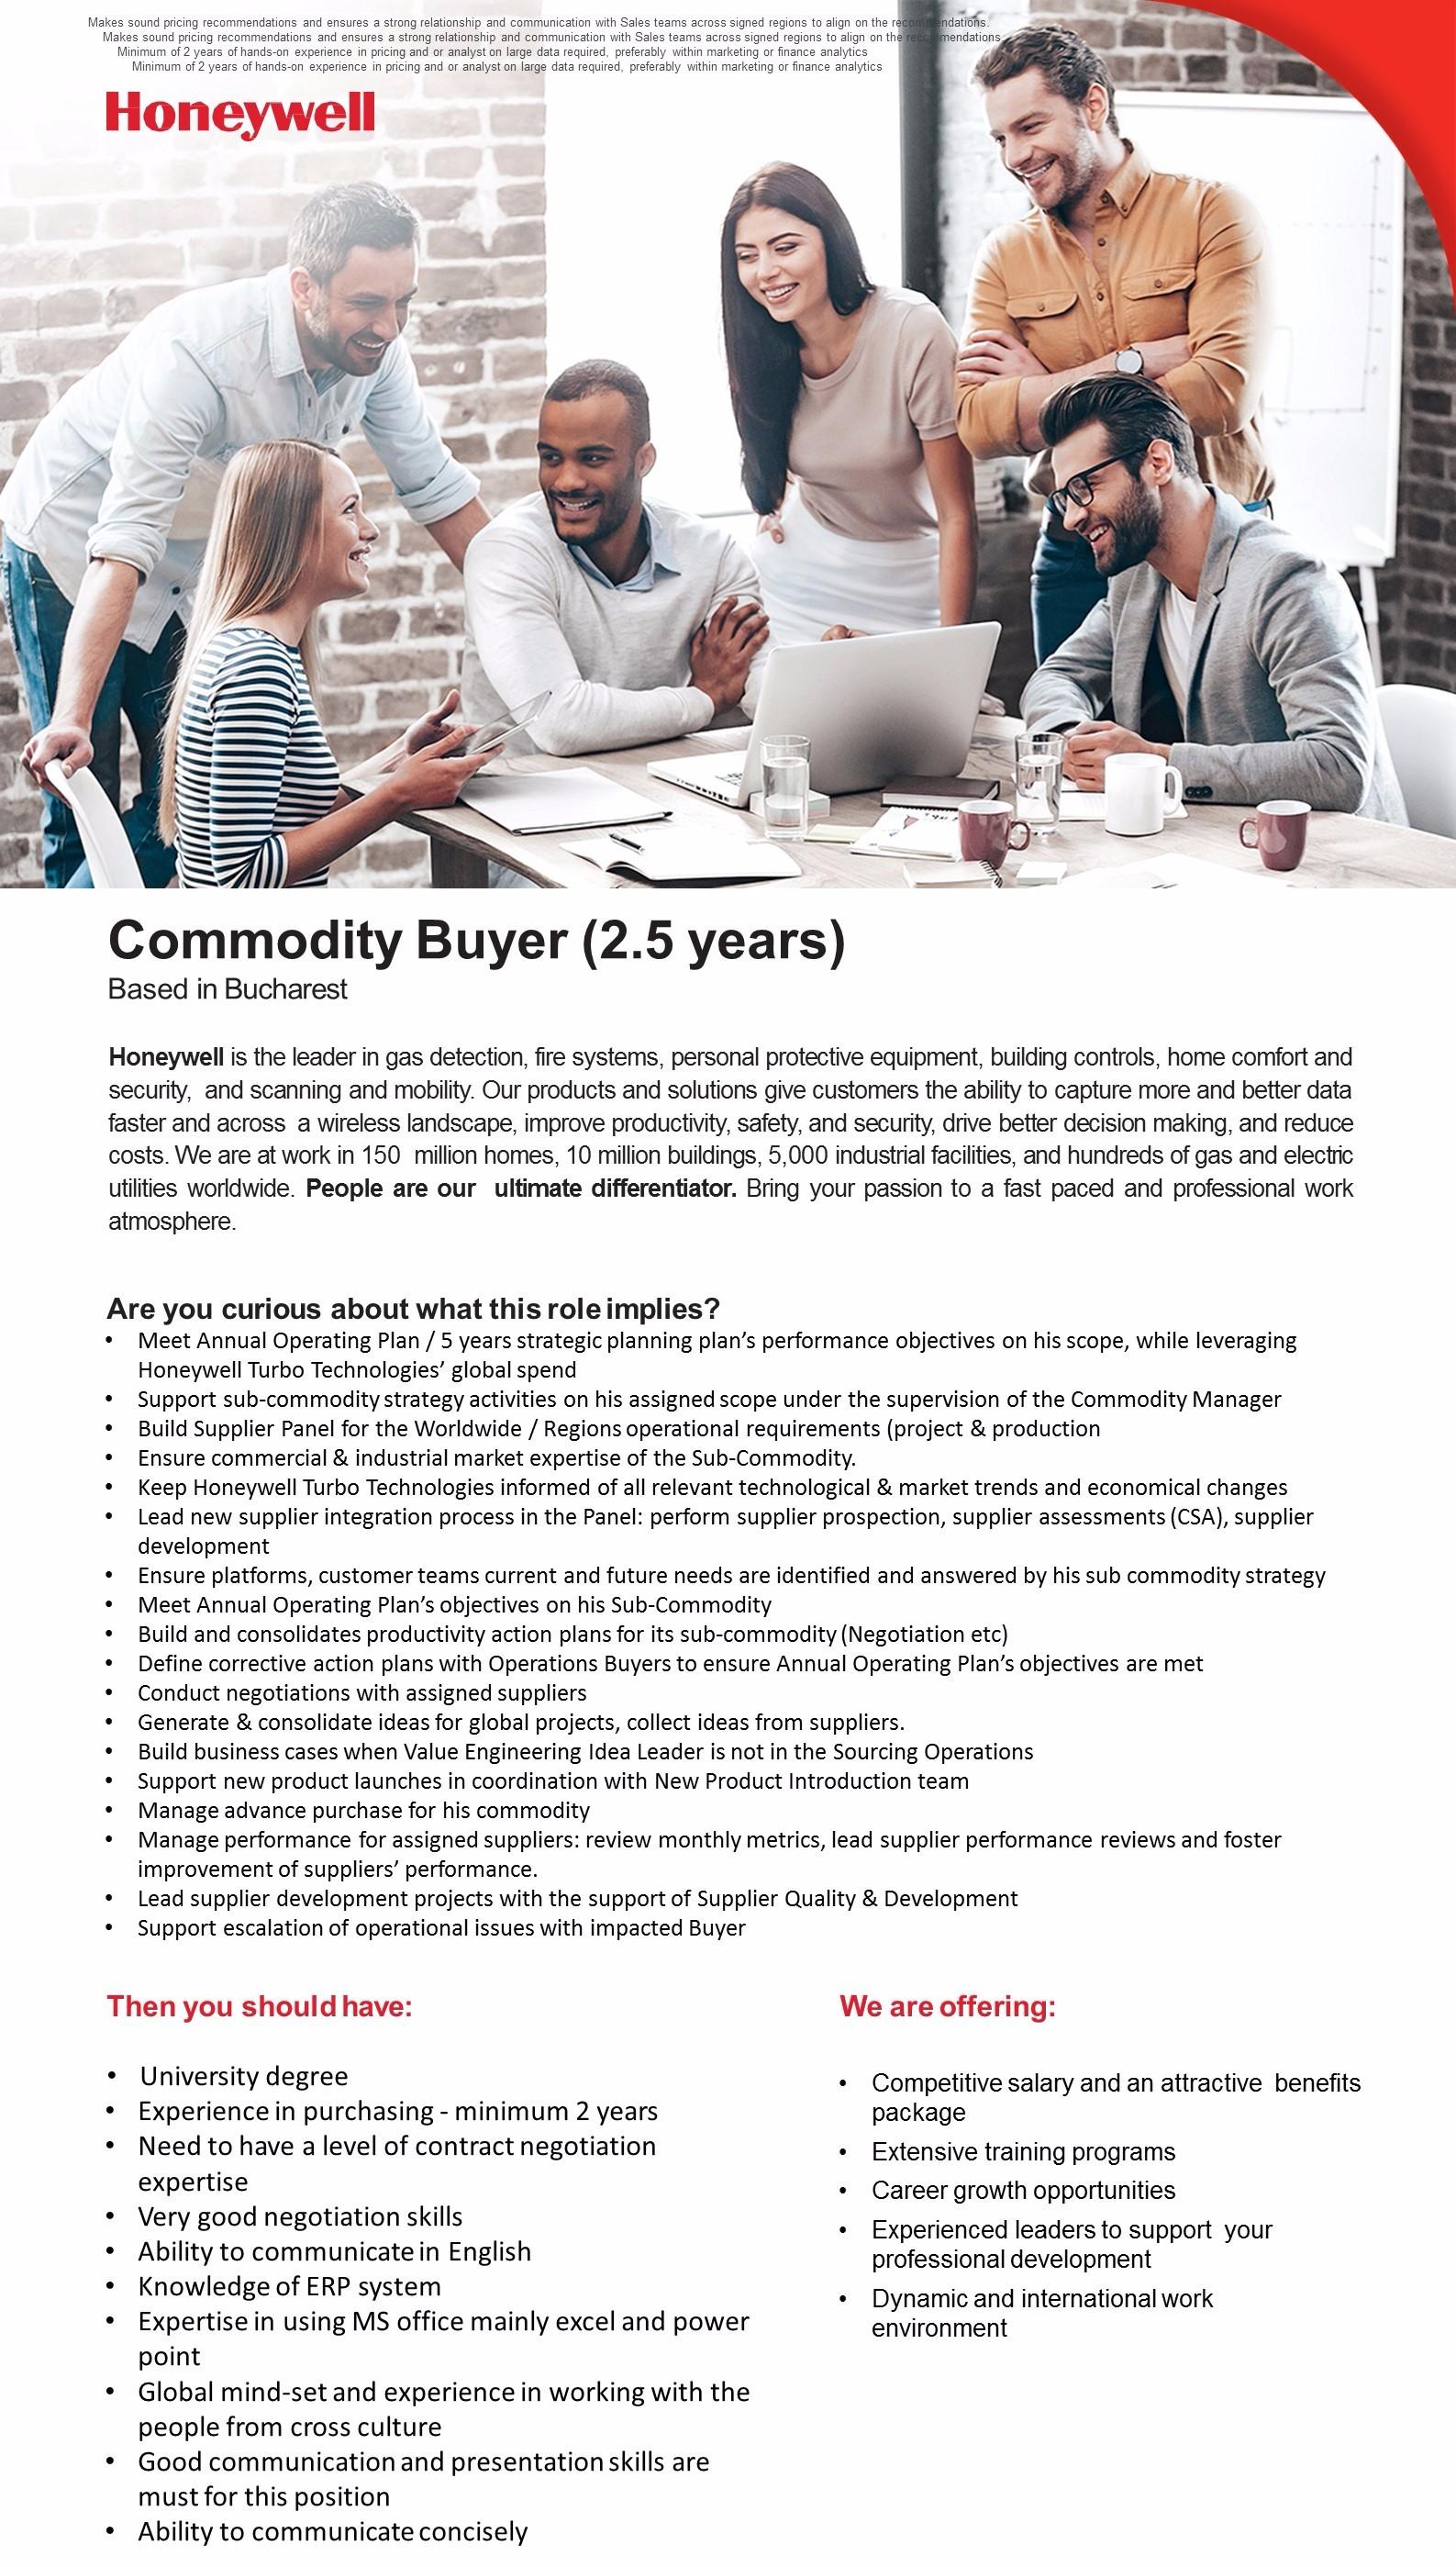 Commodity buyer (2,5 years)